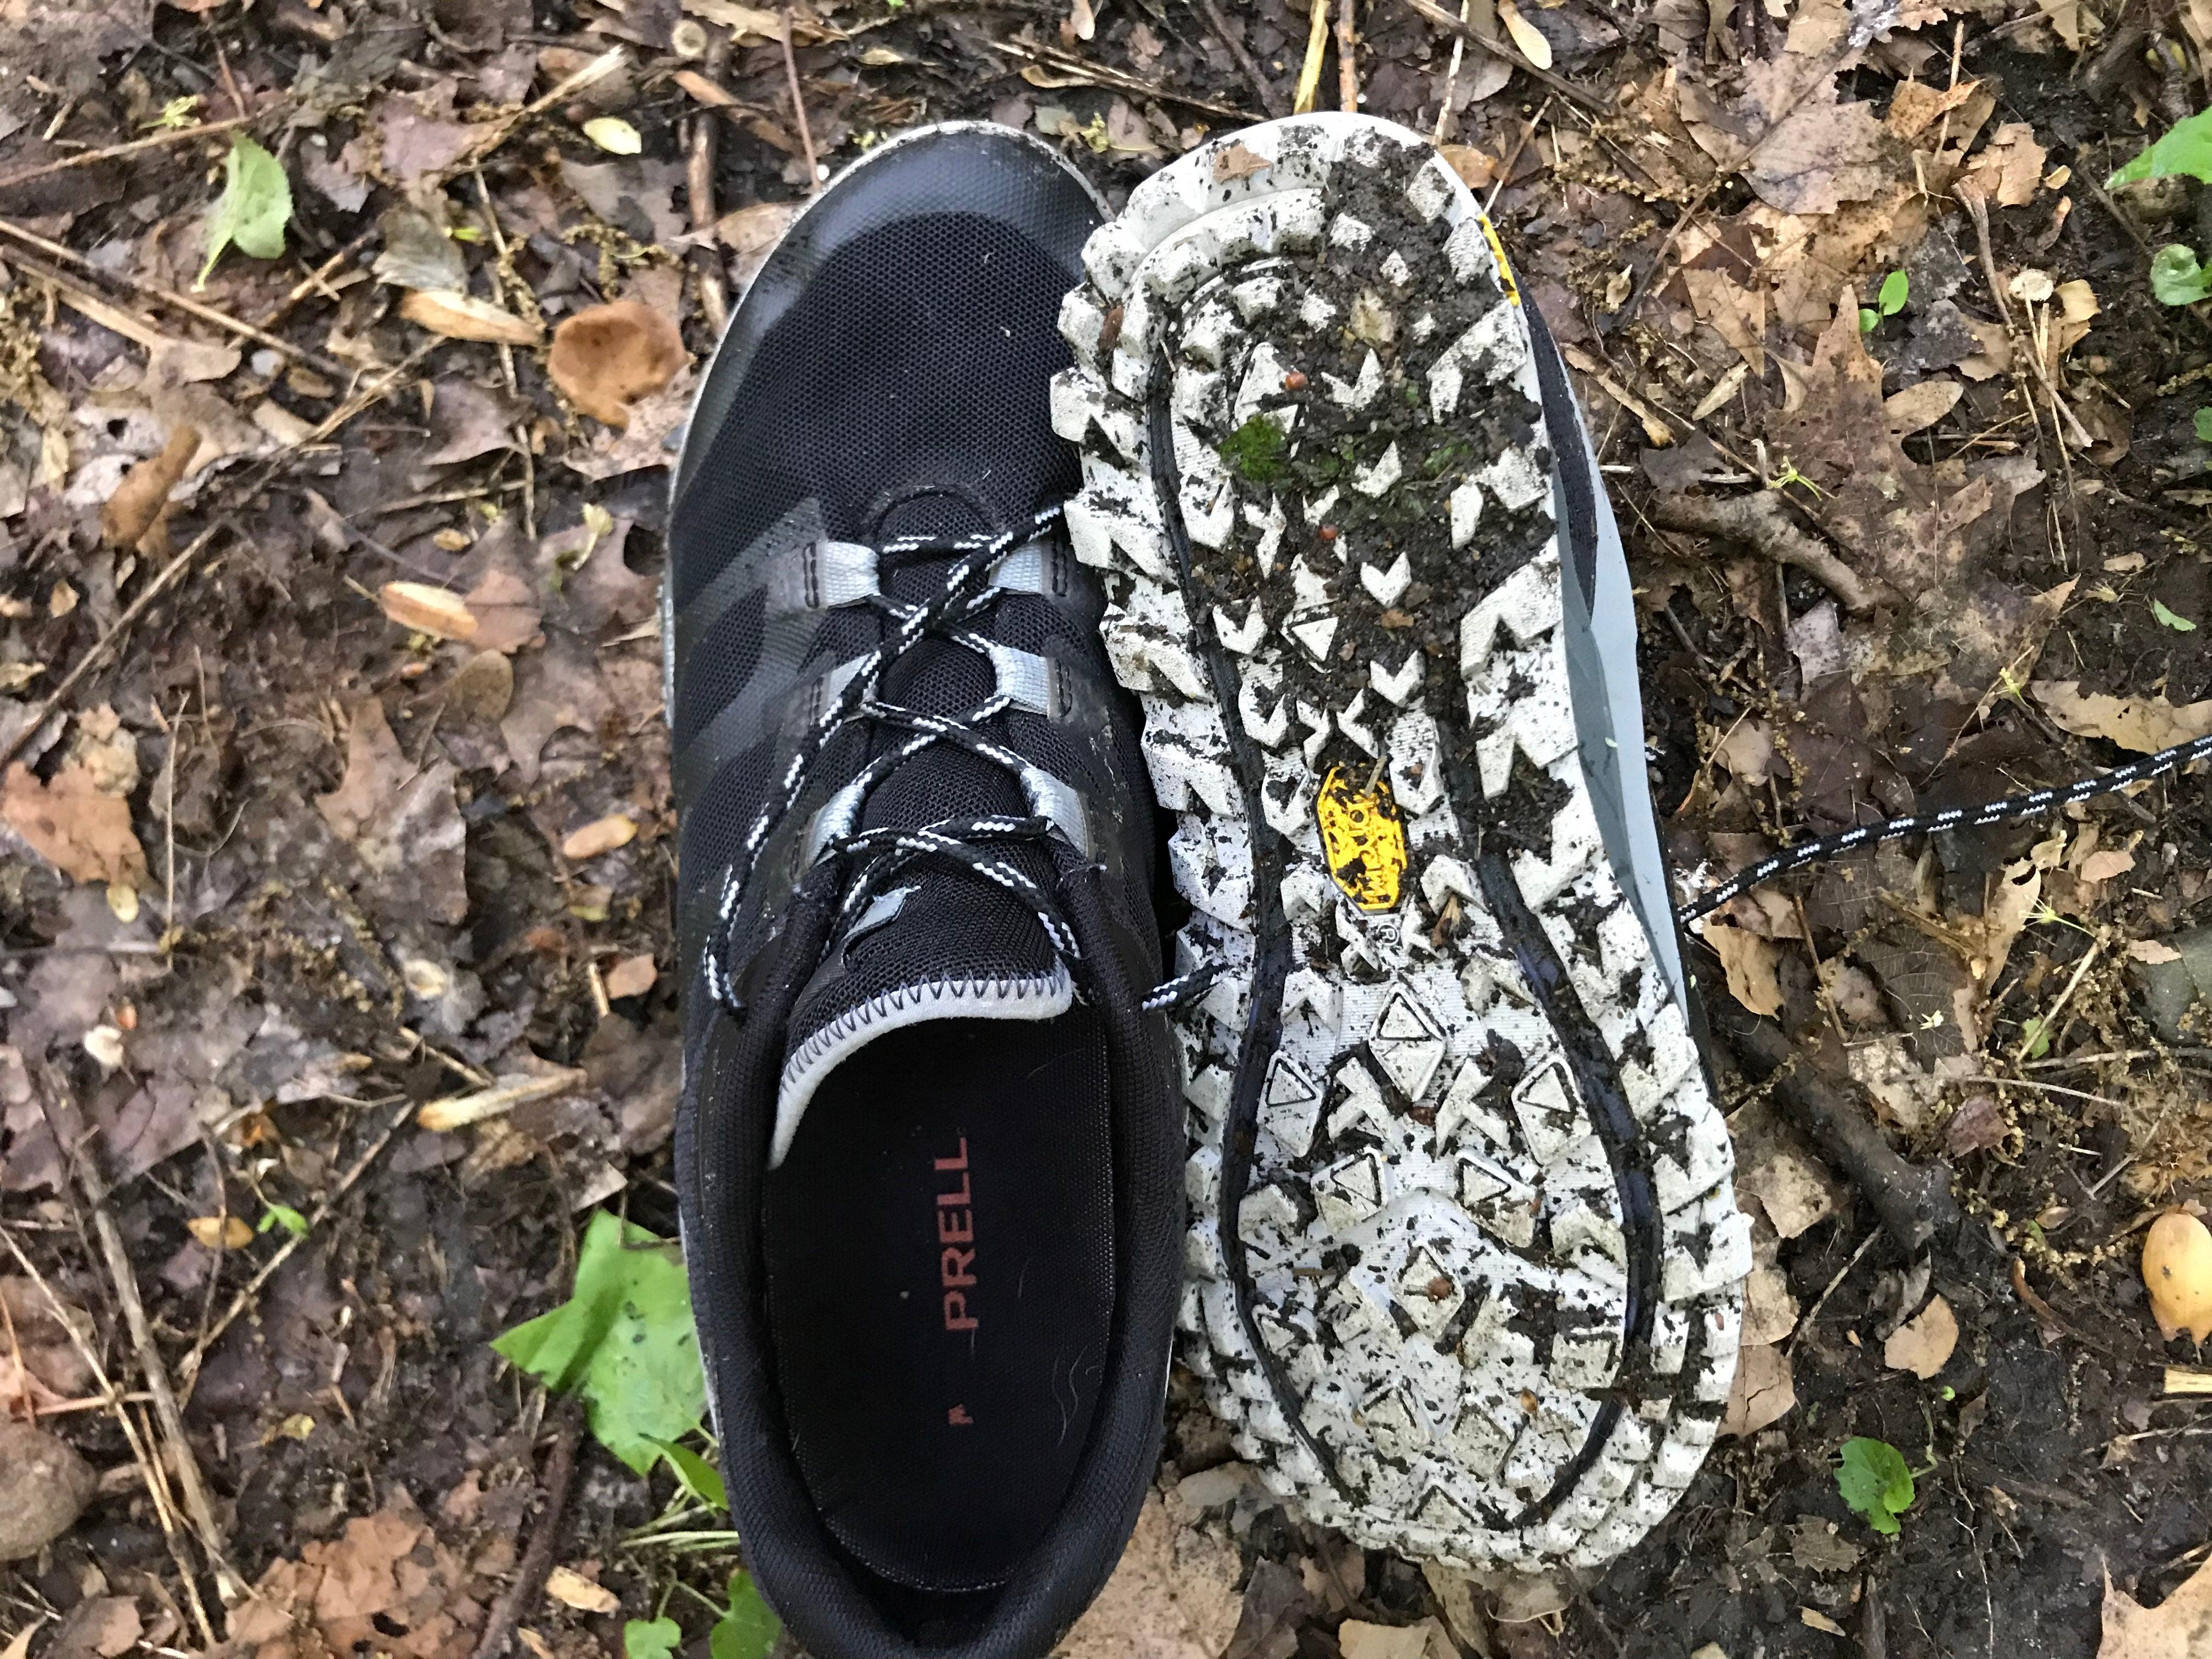 Merrell Antora trail shoe tread